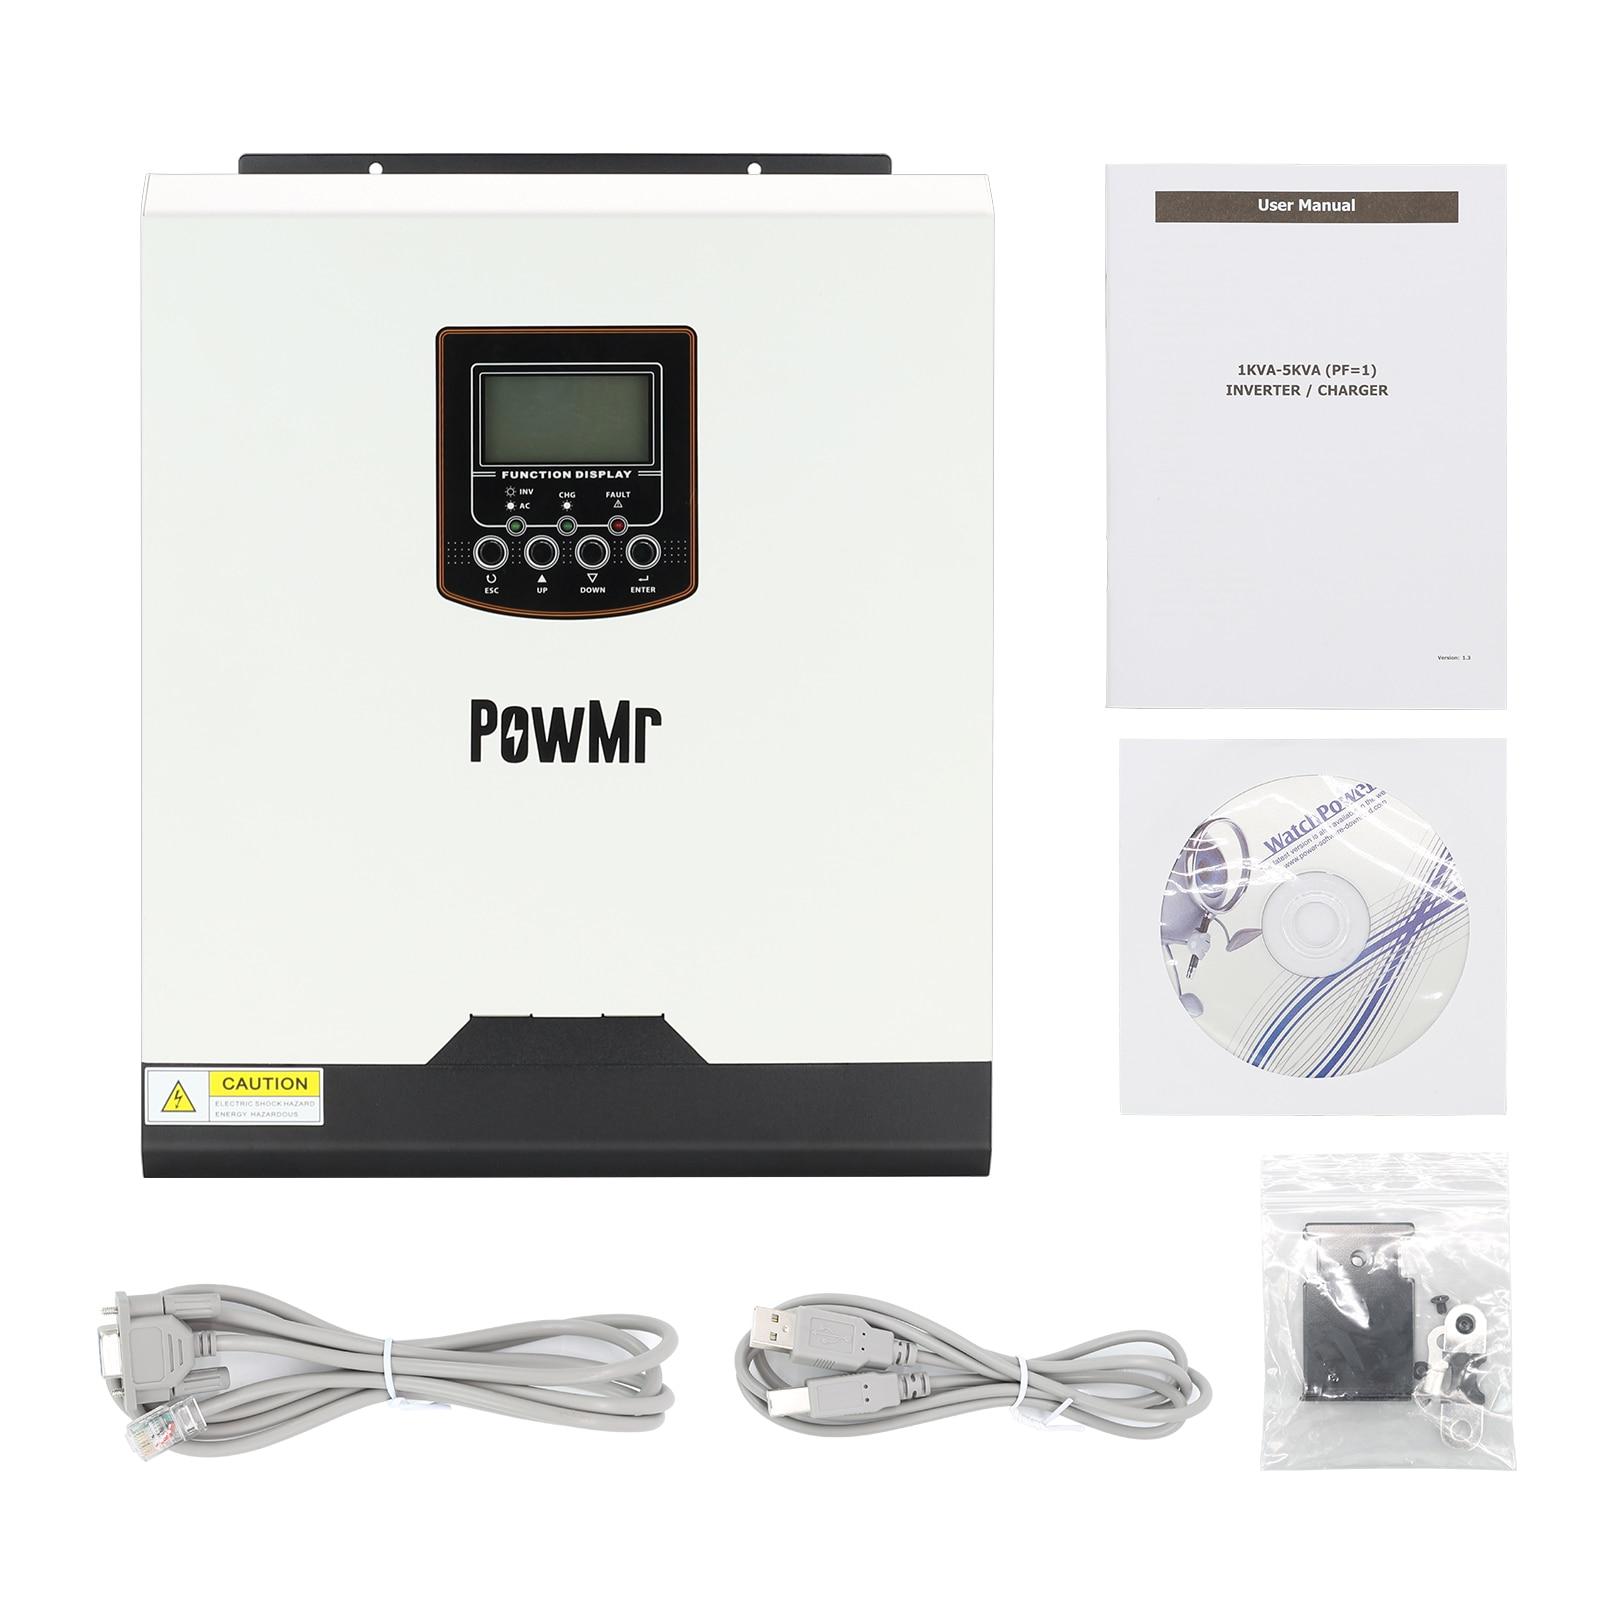 powmr 3kva inversor solar hibrido 24v 220v 04